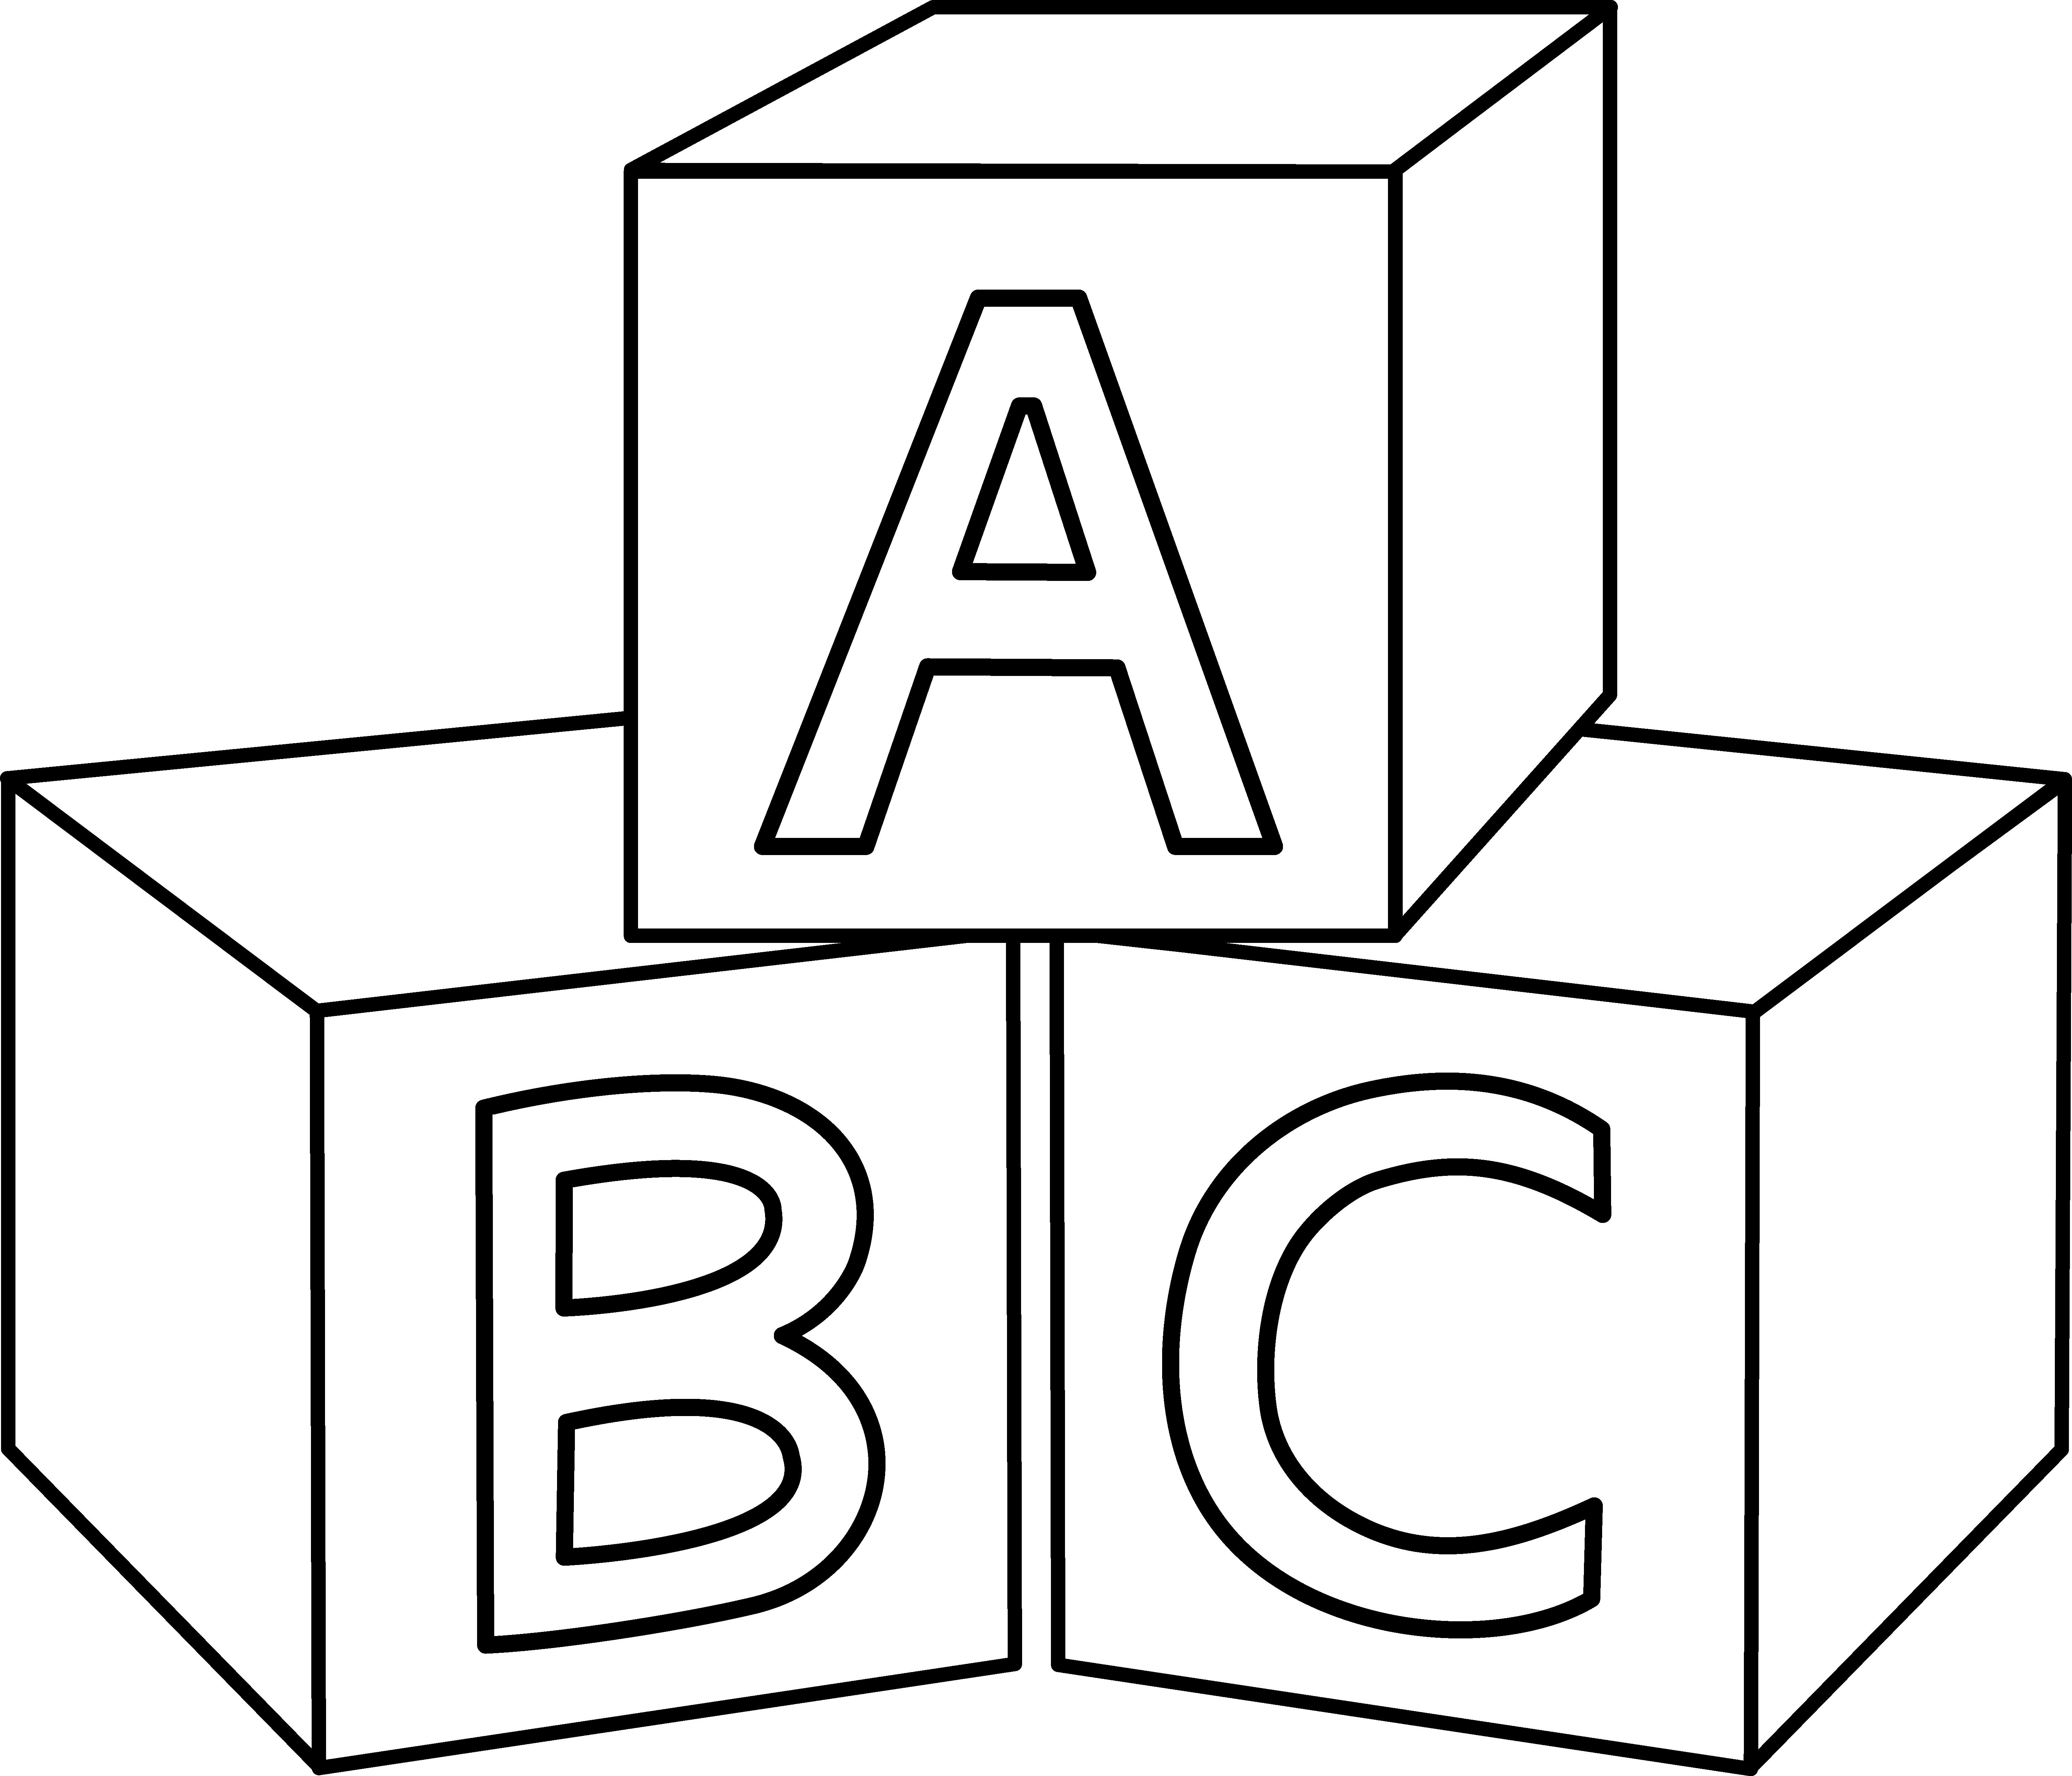 ABC Blocks Coloring Page - Abc Blocks Clip Art